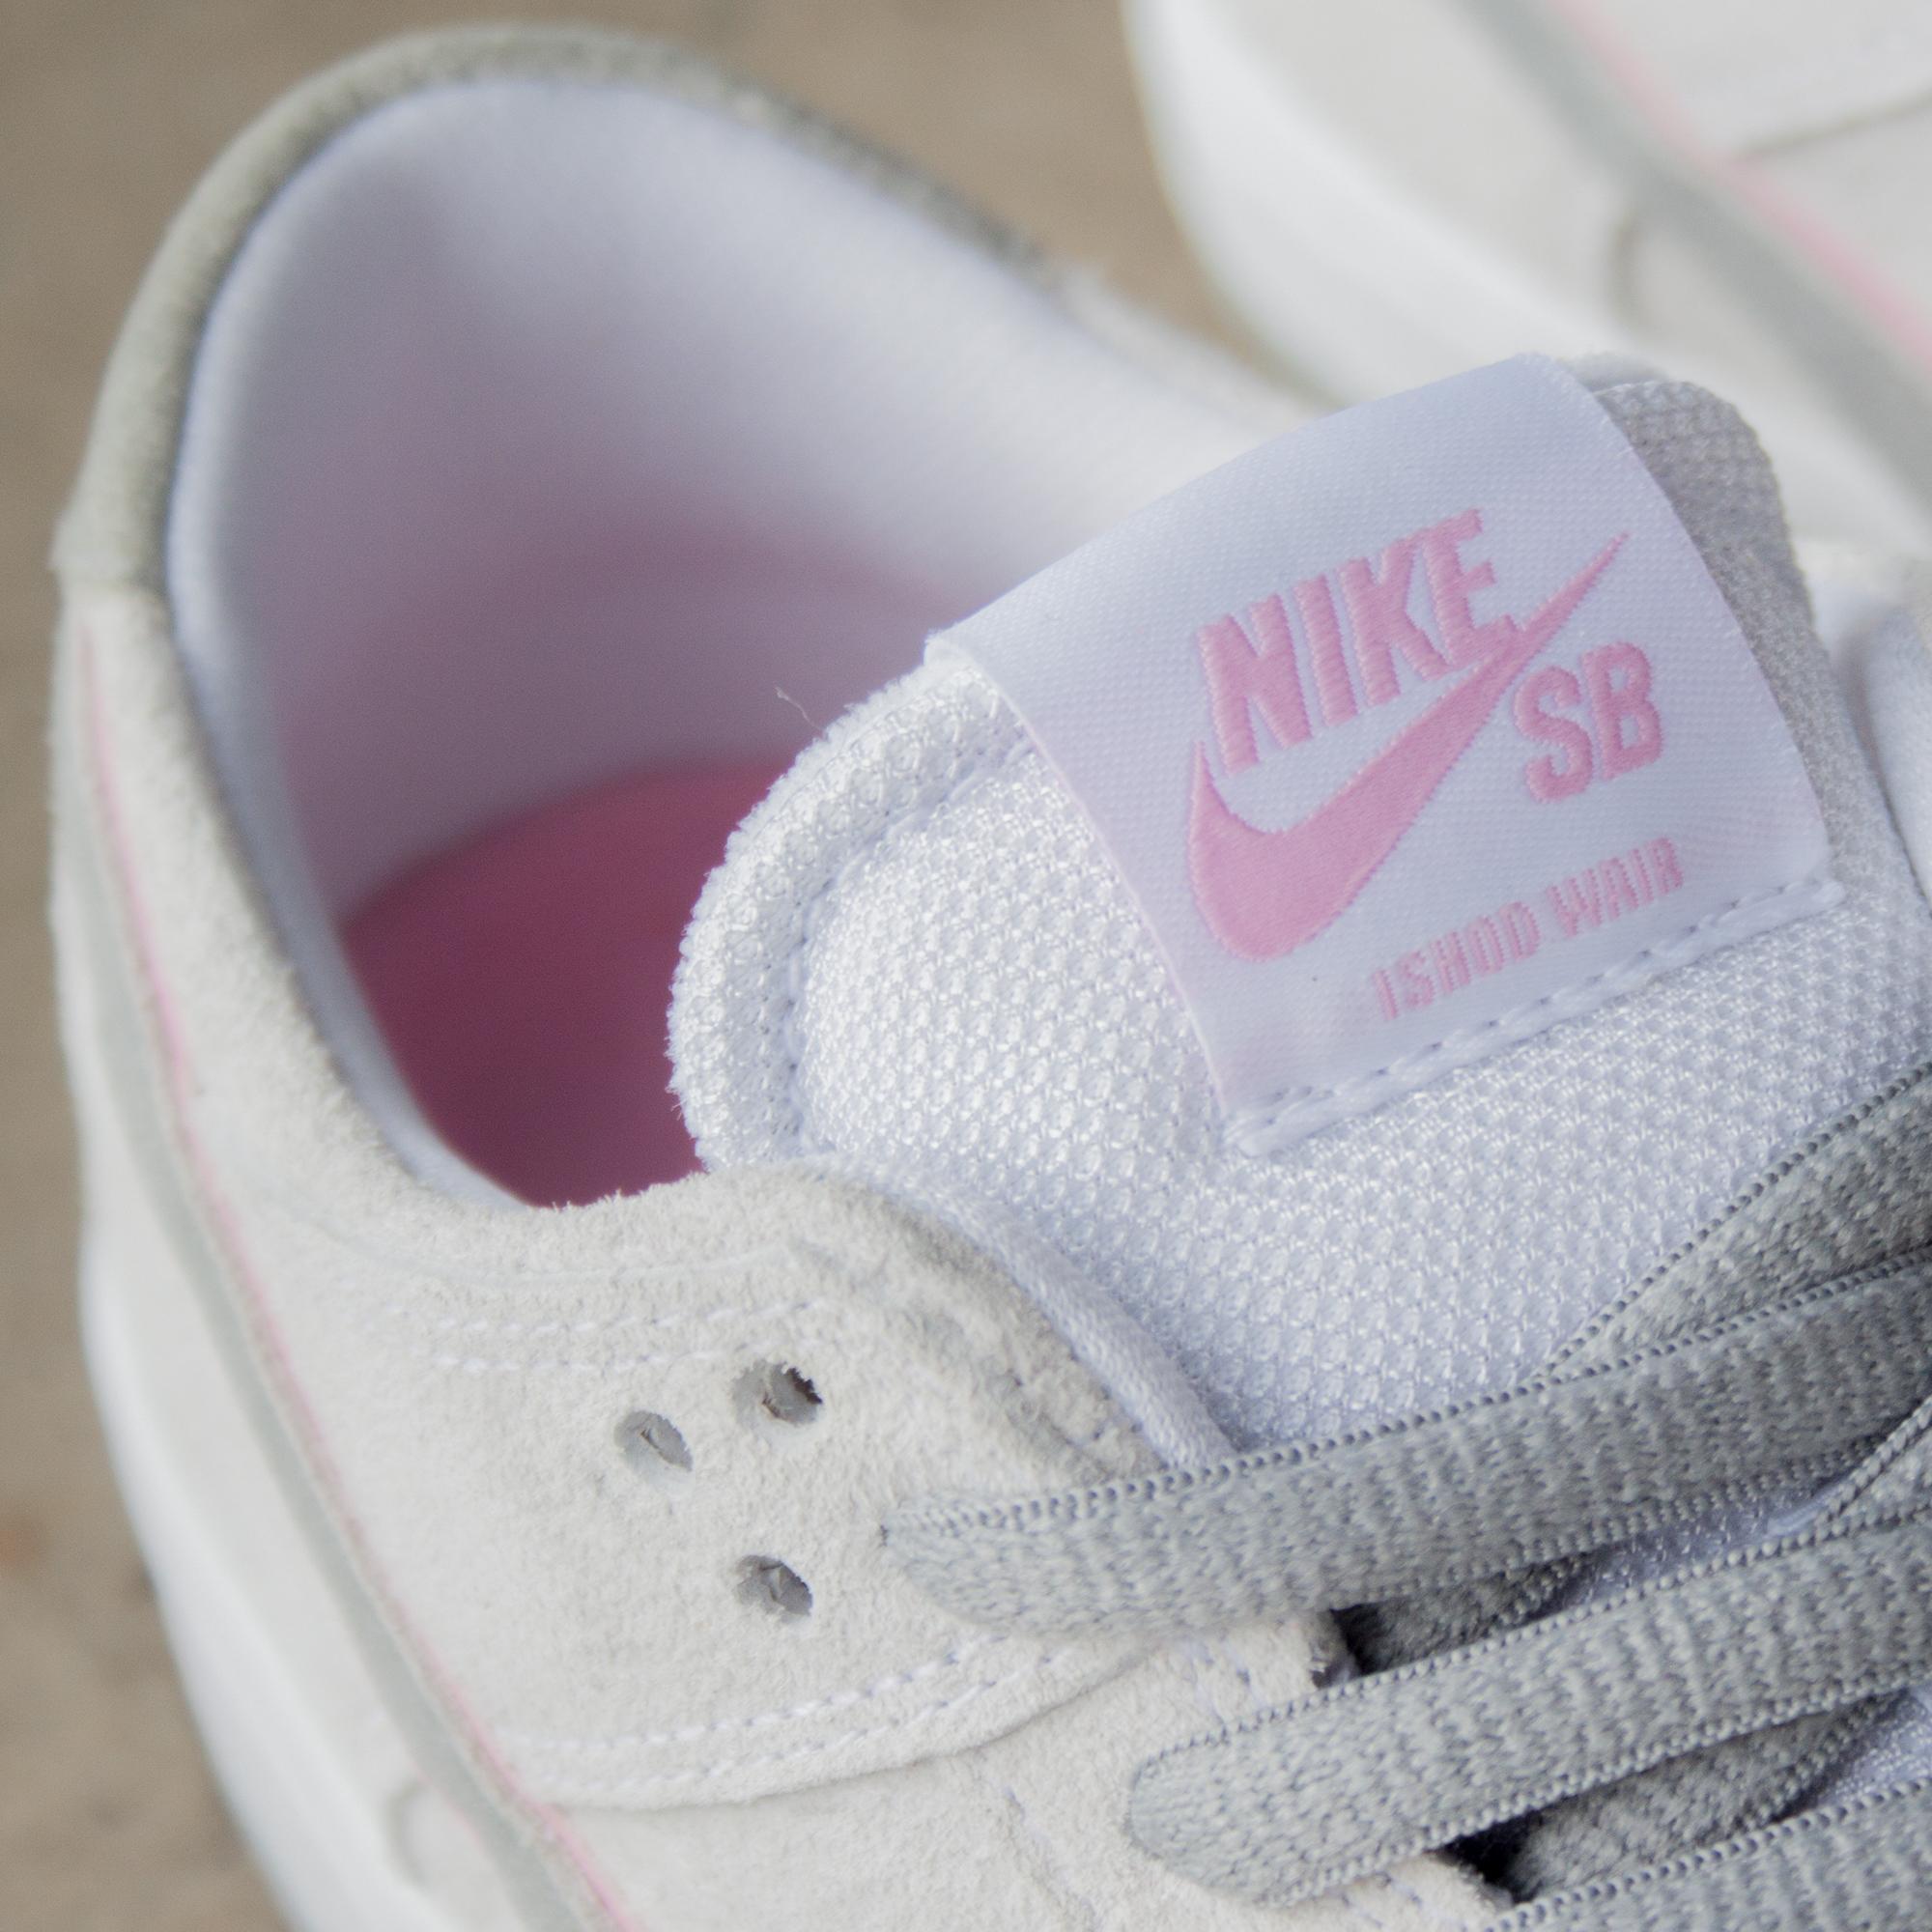 The Nike SB Dunk Low Pro Ishod Wair